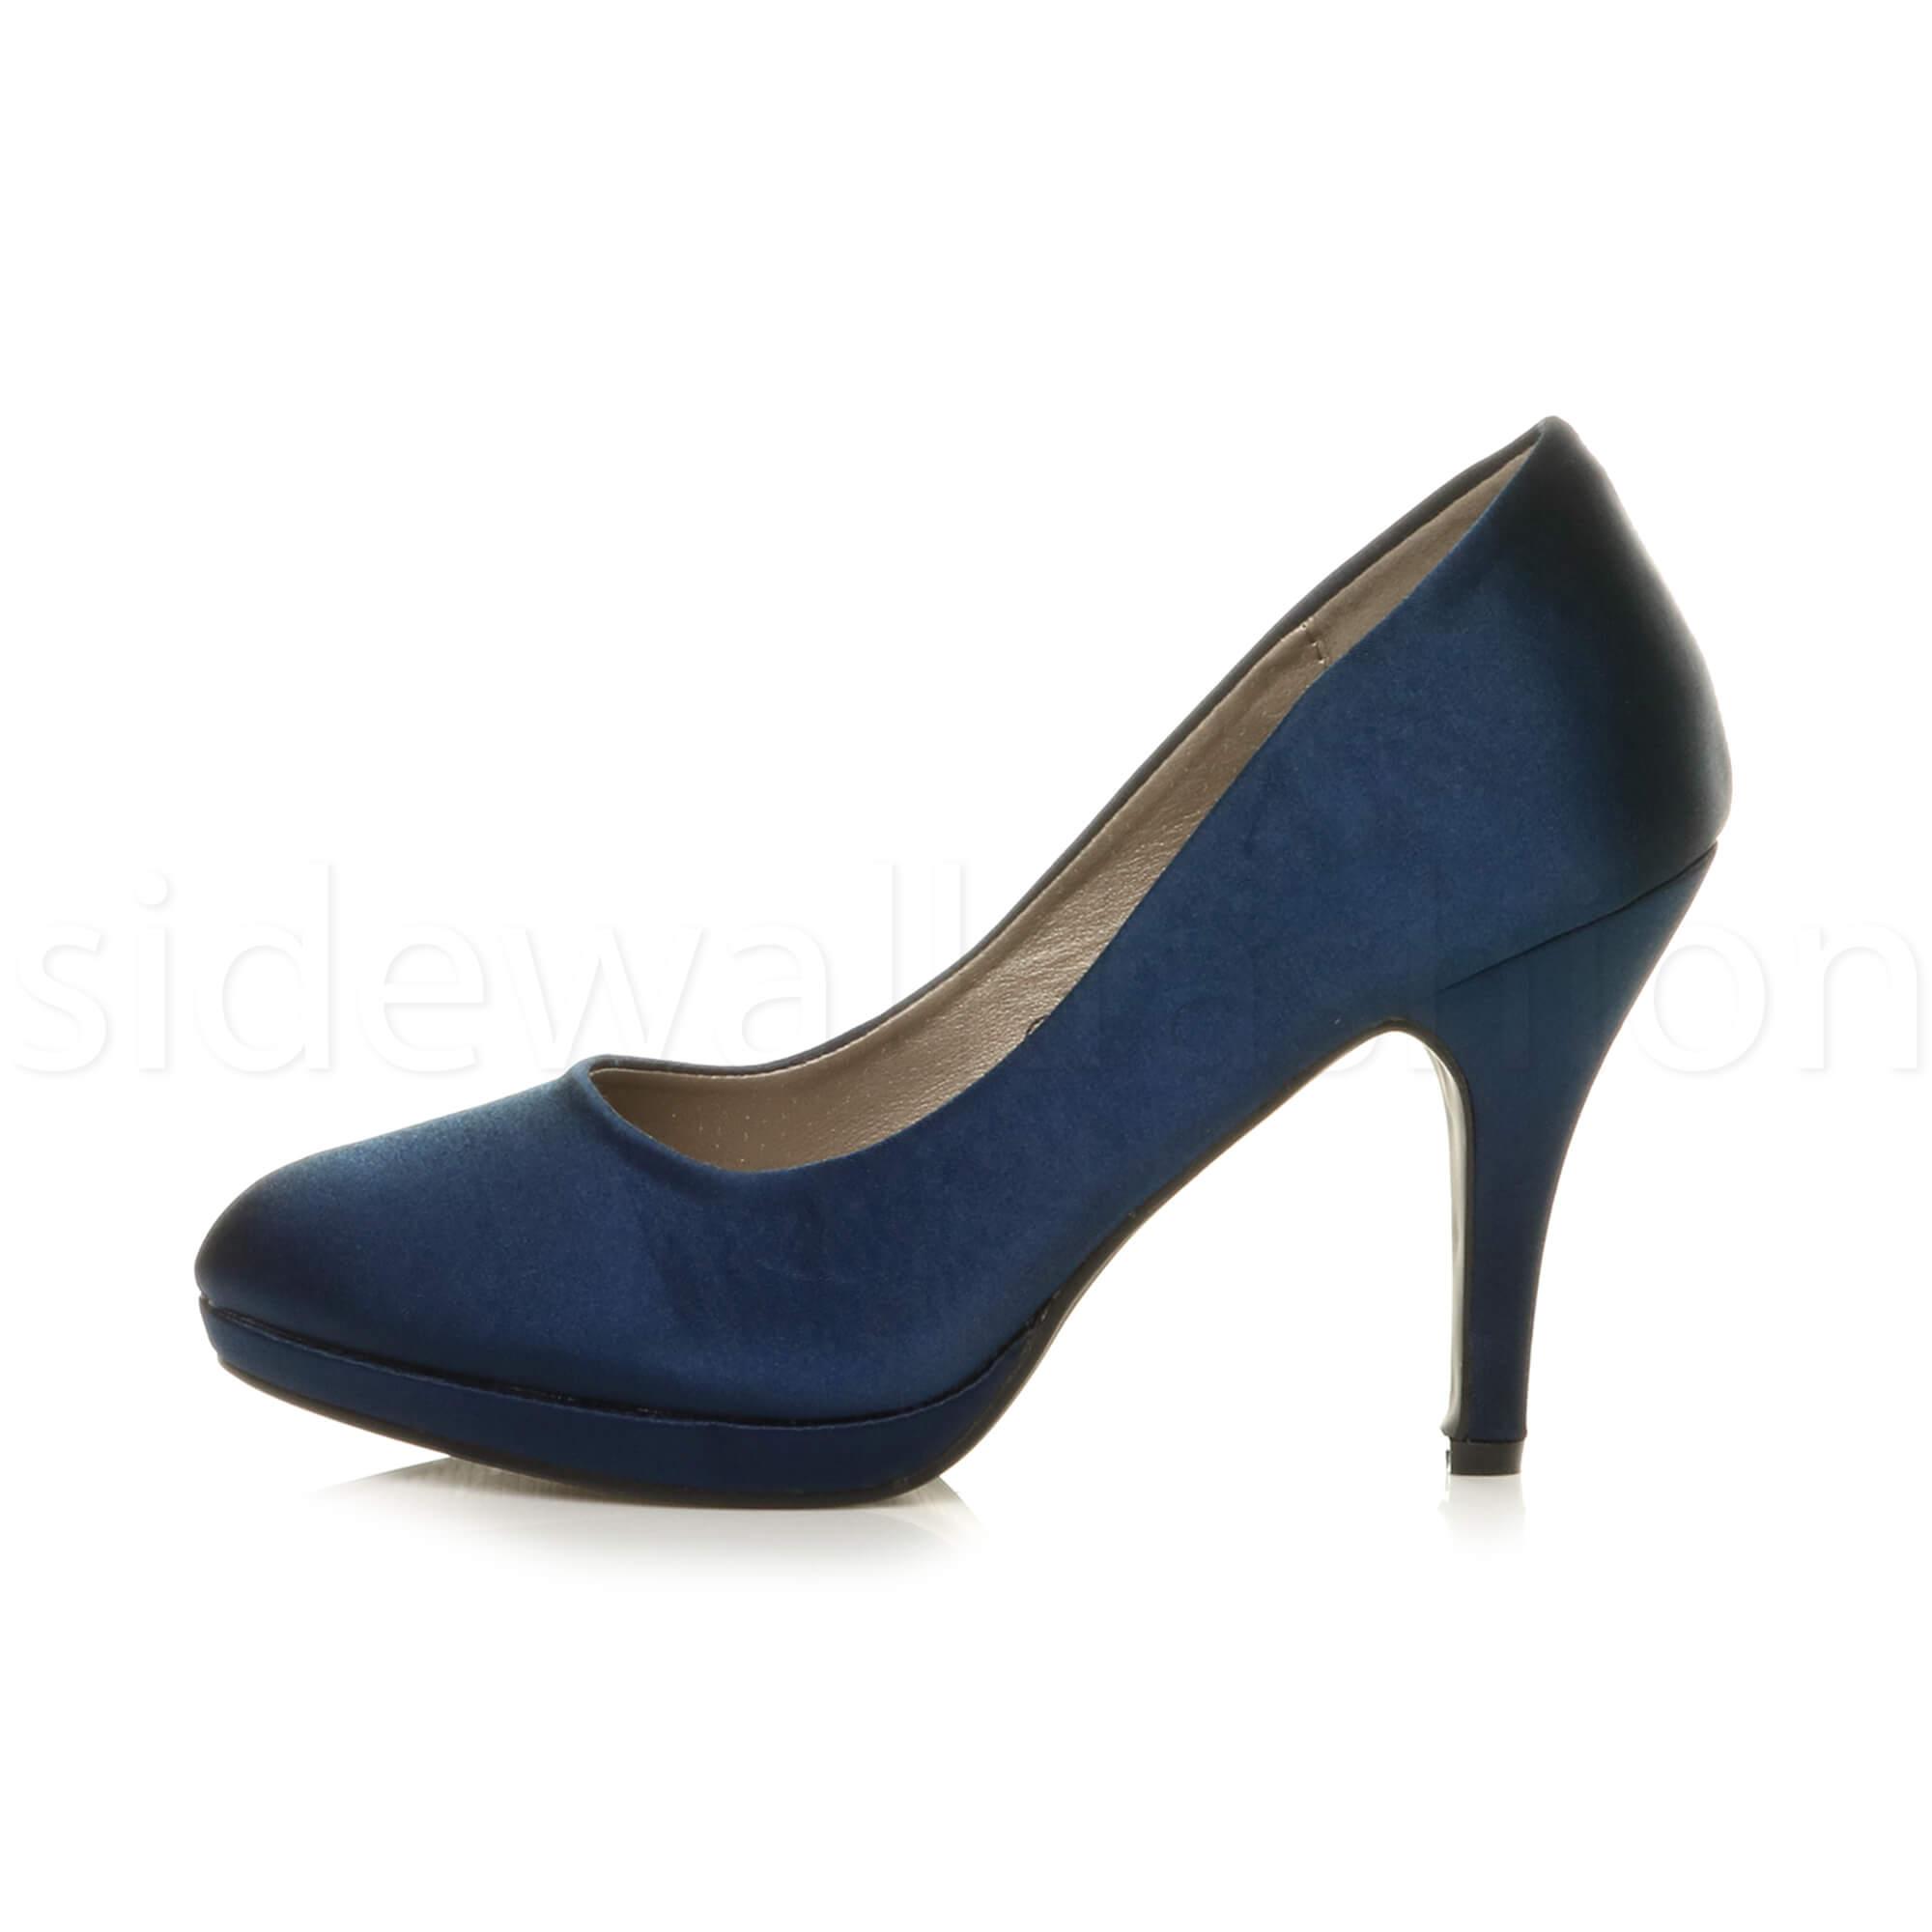 Womens-ladies-high-mid-heel-platform-wedding-evening-bridesmaid-court-shoes-size thumbnail 115